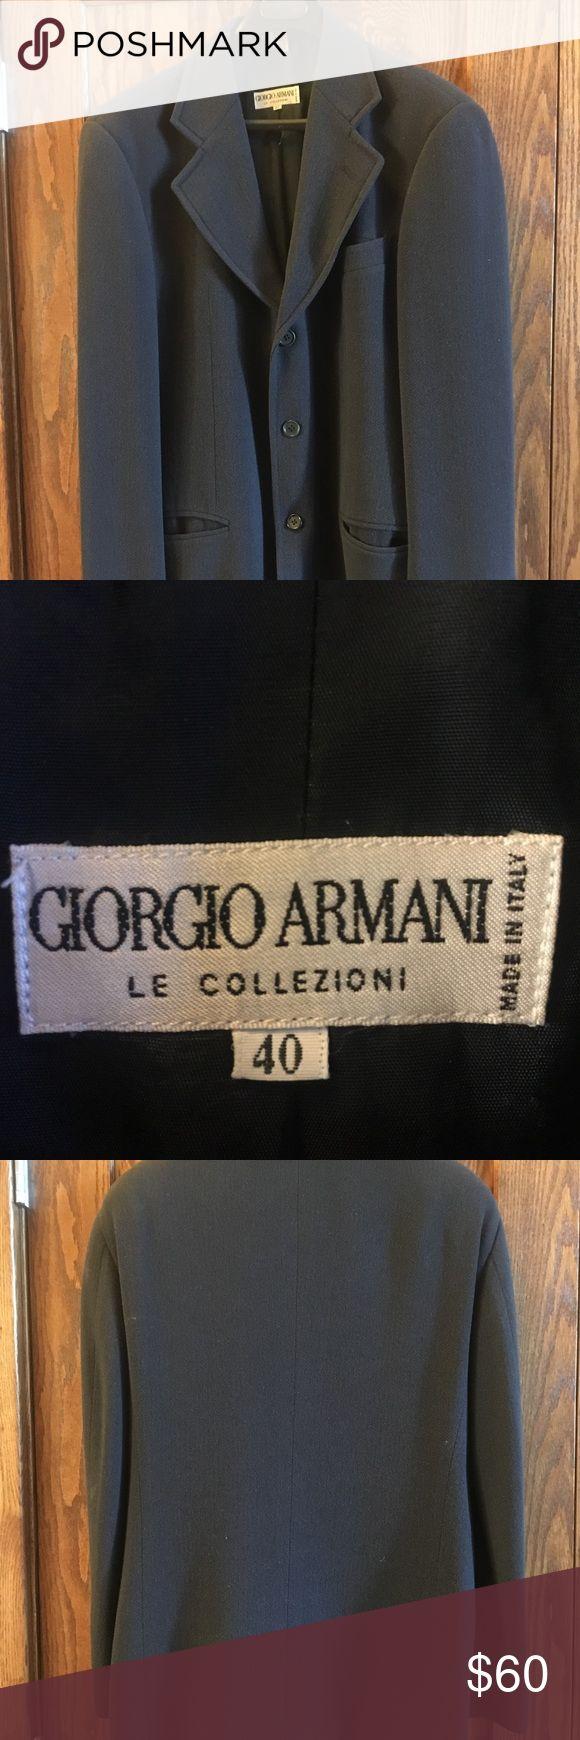 Giorgio Armani Men's navy sport coat or blazer Giorgio Armani Men's navy Sport coat. Size Men's 50 regular. Giorgio Armani Suits & Blazers Sport Coats & Blazers